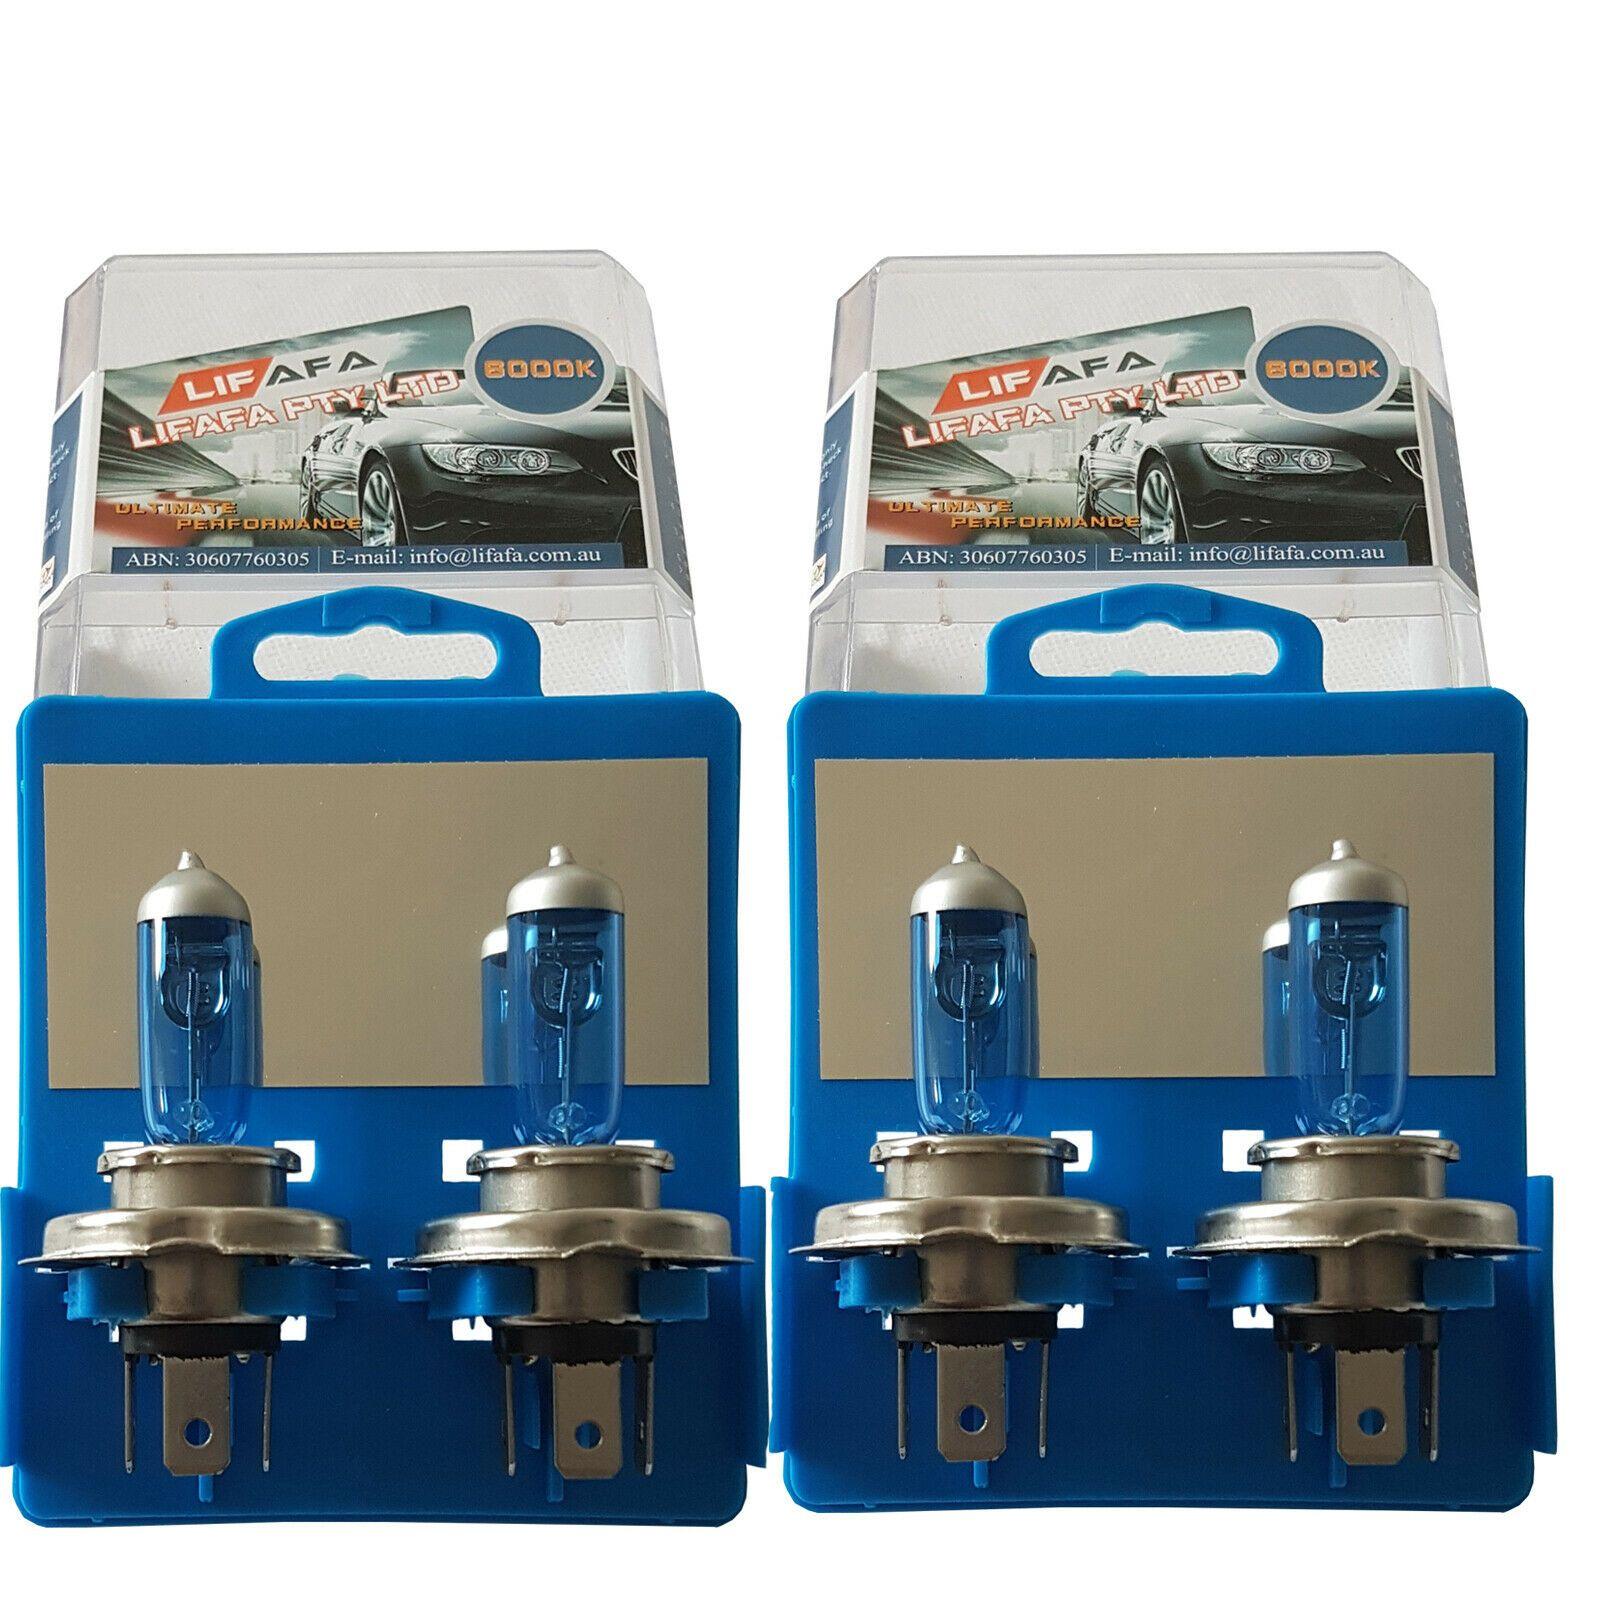 4x H4 55W 12V 5000K Head Light Globes Car Light Bulbs Halogen XENON Super White